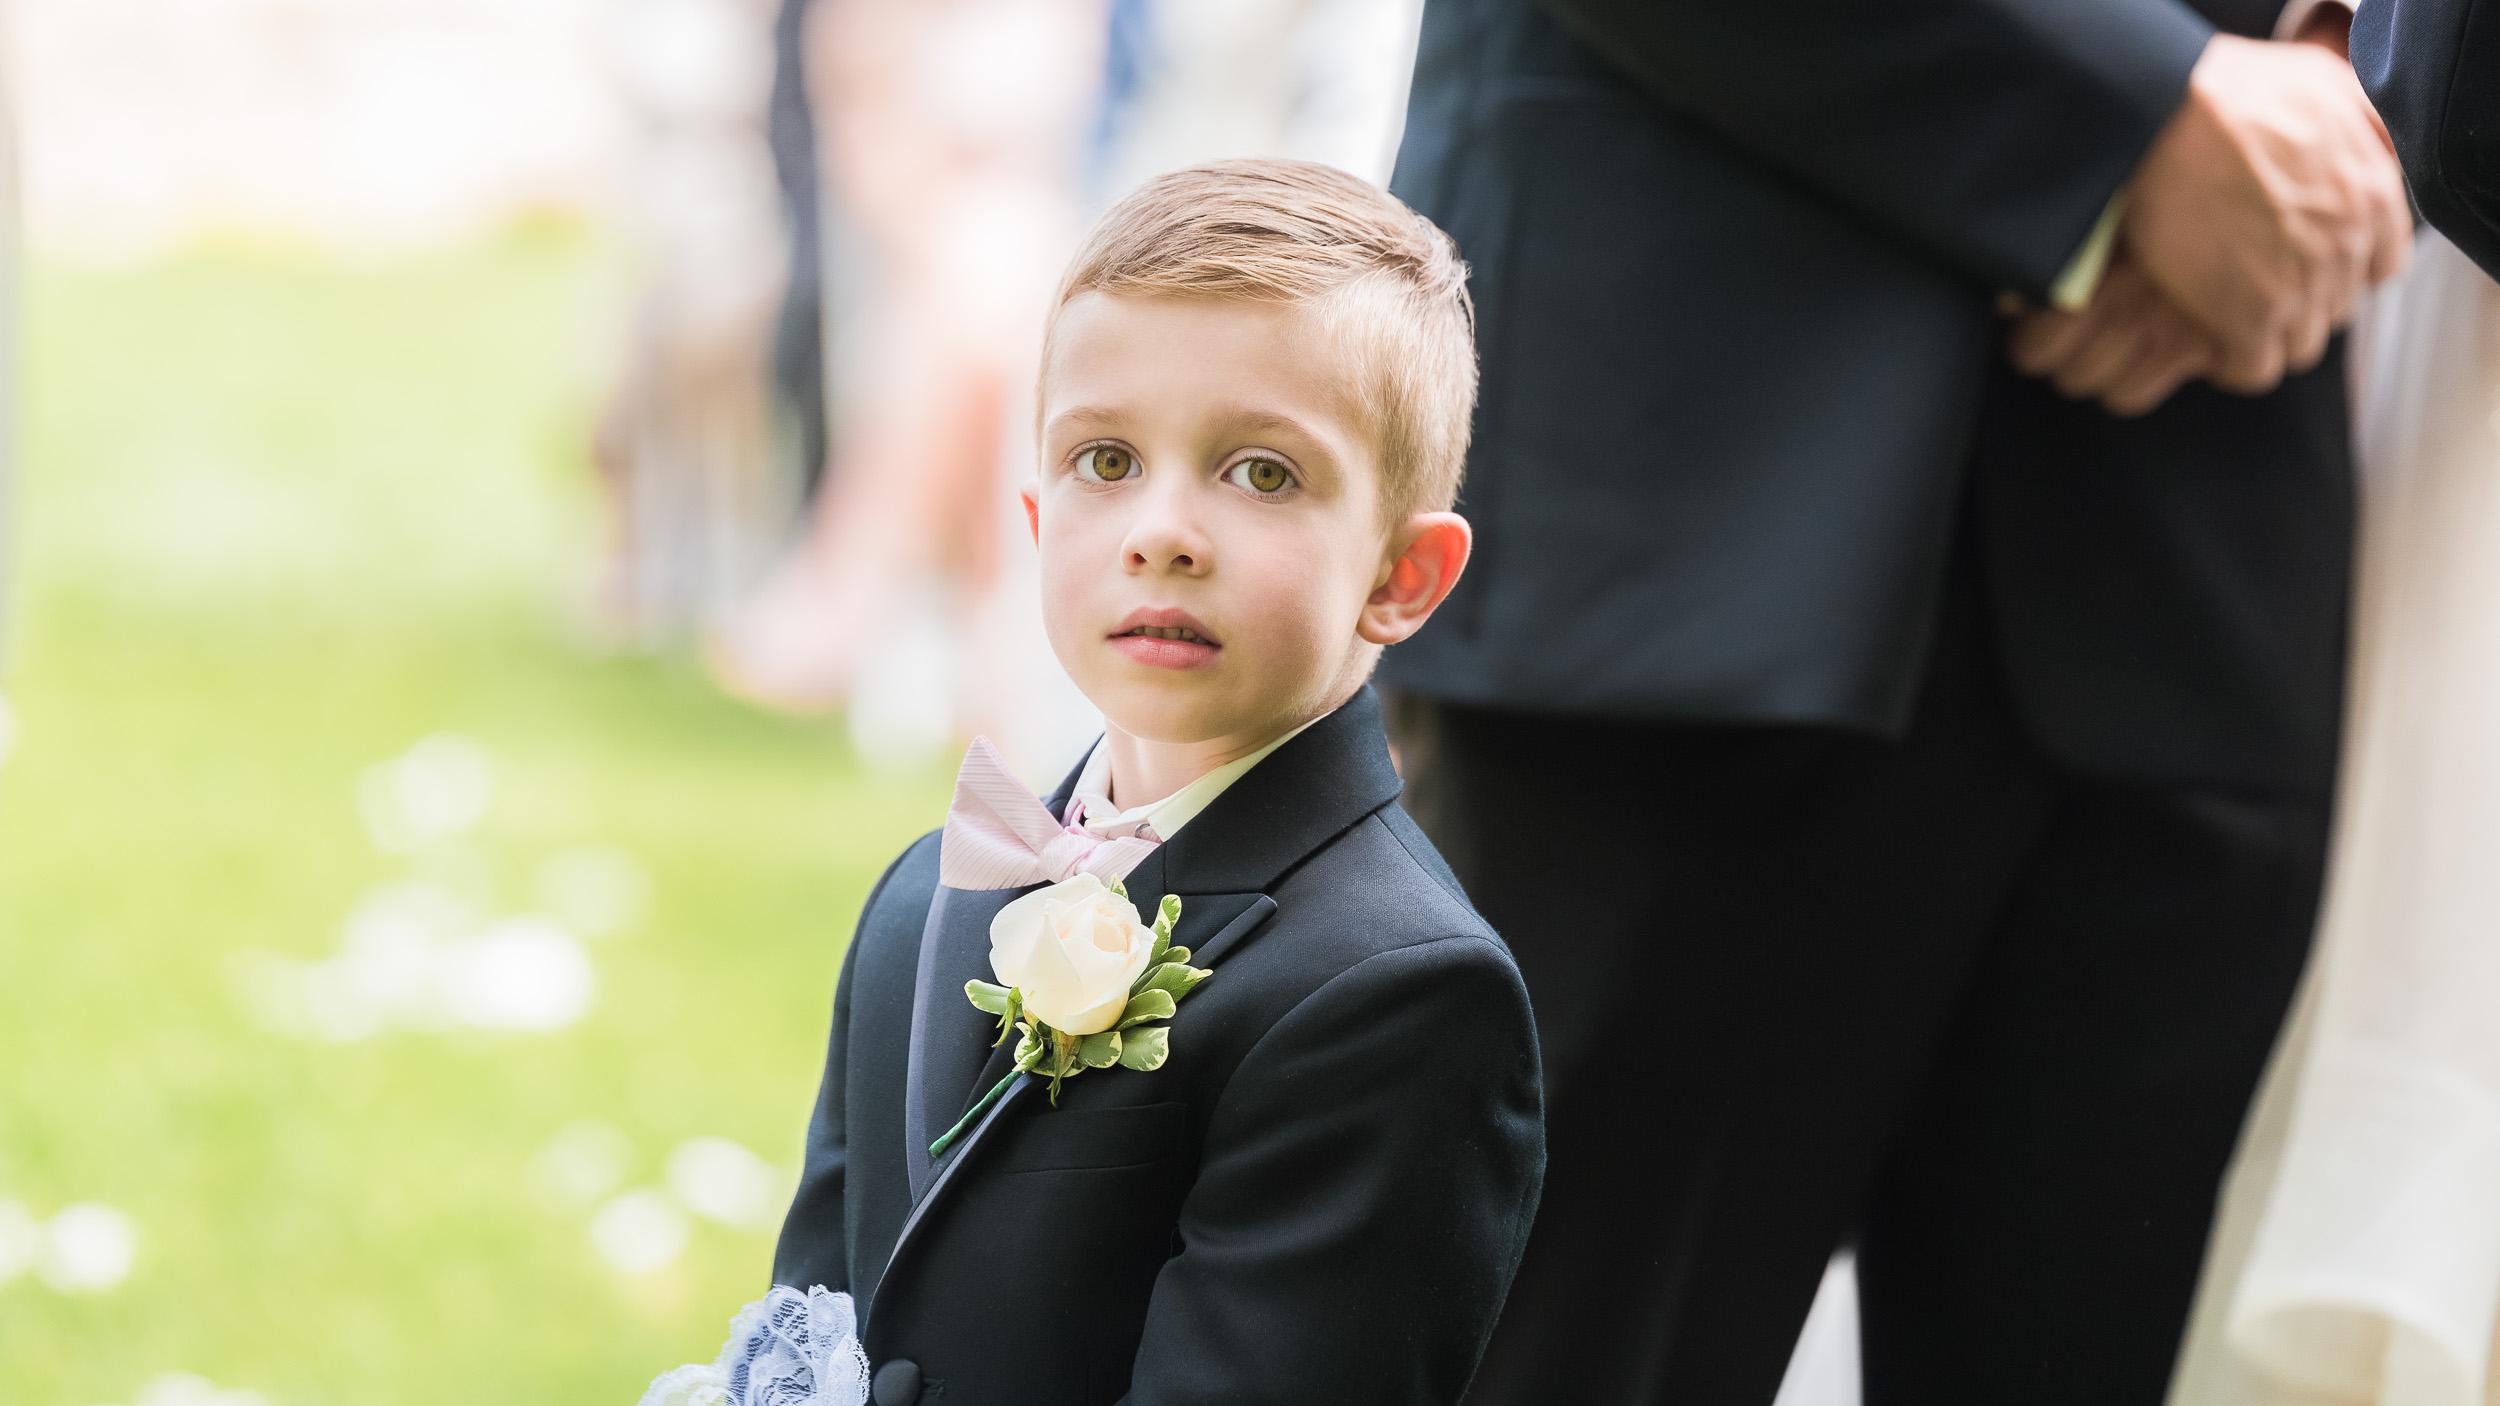 Wedding-ceremony-son-of-the-groom.jpg